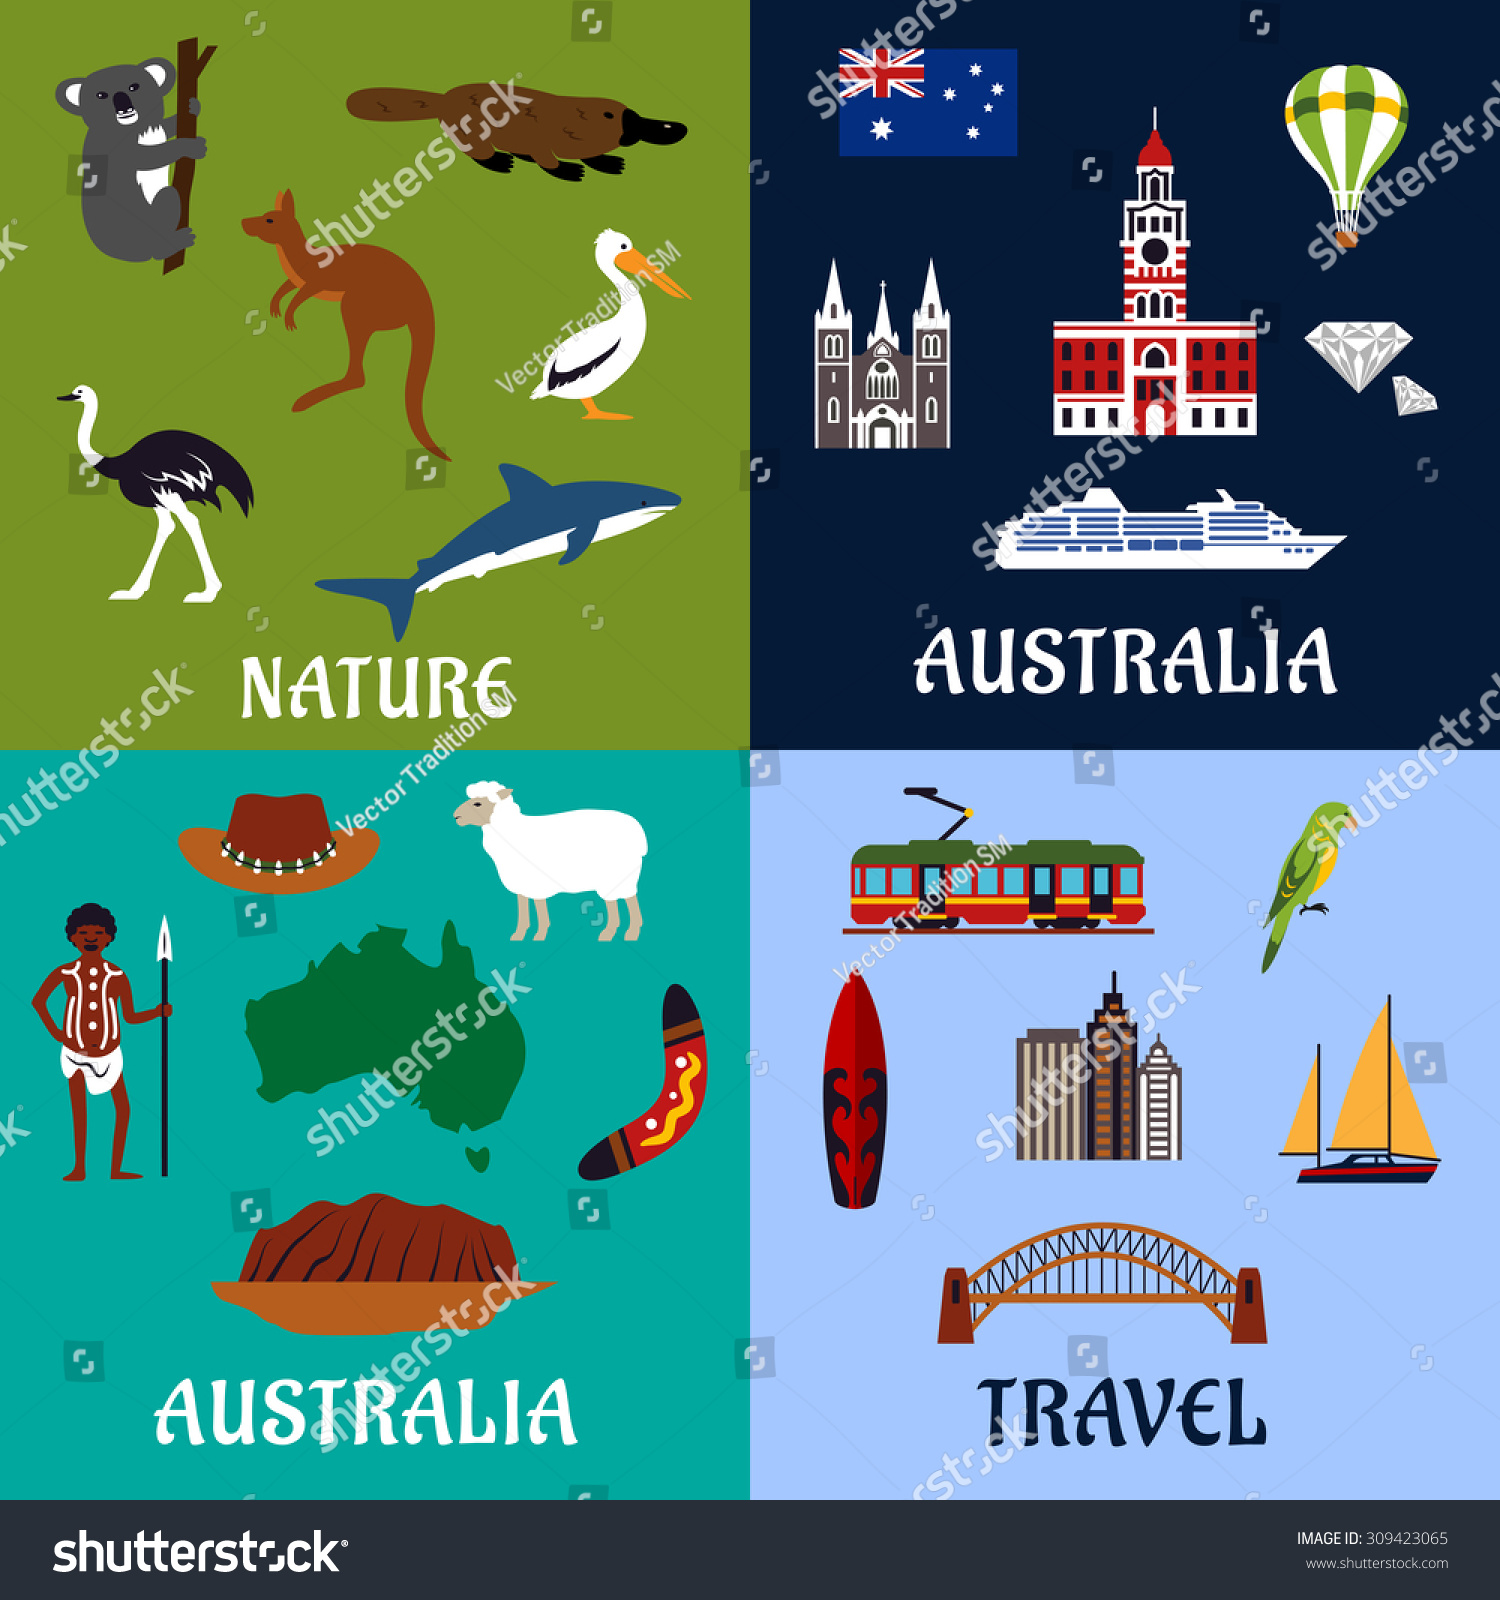 Australia travel symbols icons flat style stock vector 309423065 australia travel symbols and icons in flat style with national flag map landmarks gumiabroncs Image collections